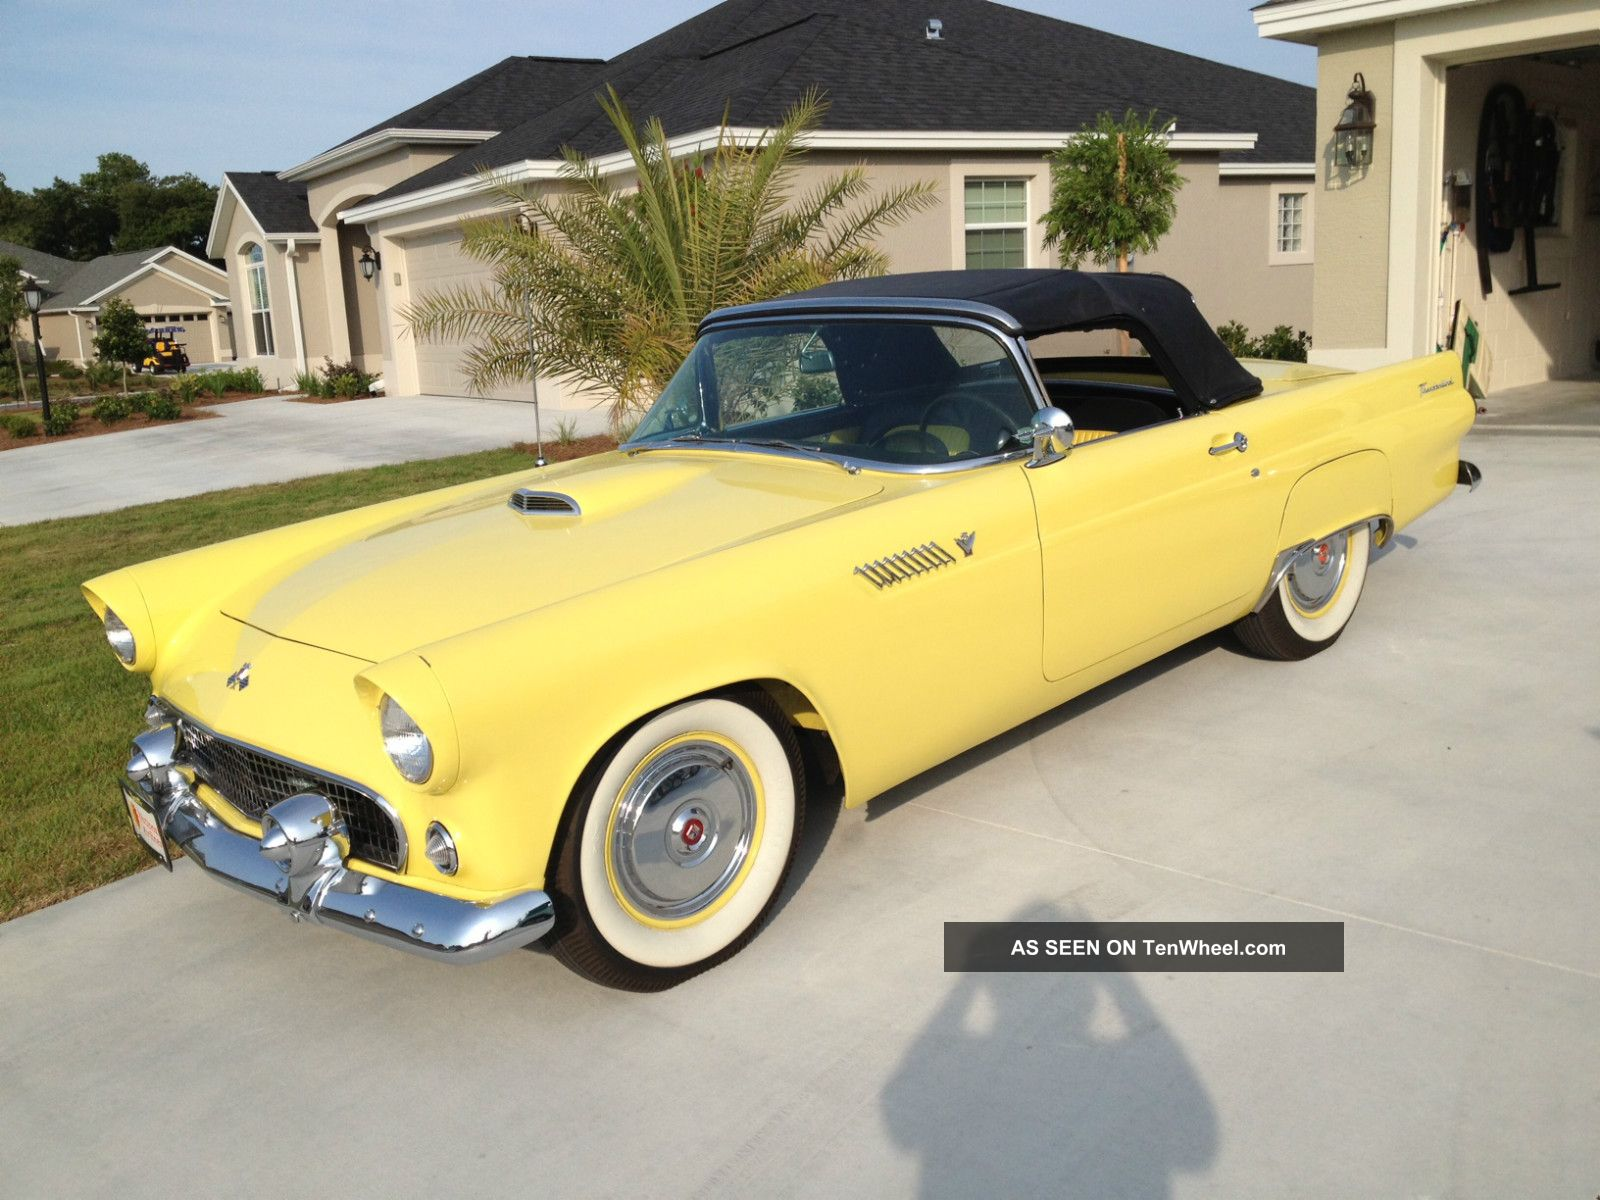 1955 Thunderbird Rare Goldenrod Yellow Paint With Black Soft Top Thunderbird photo